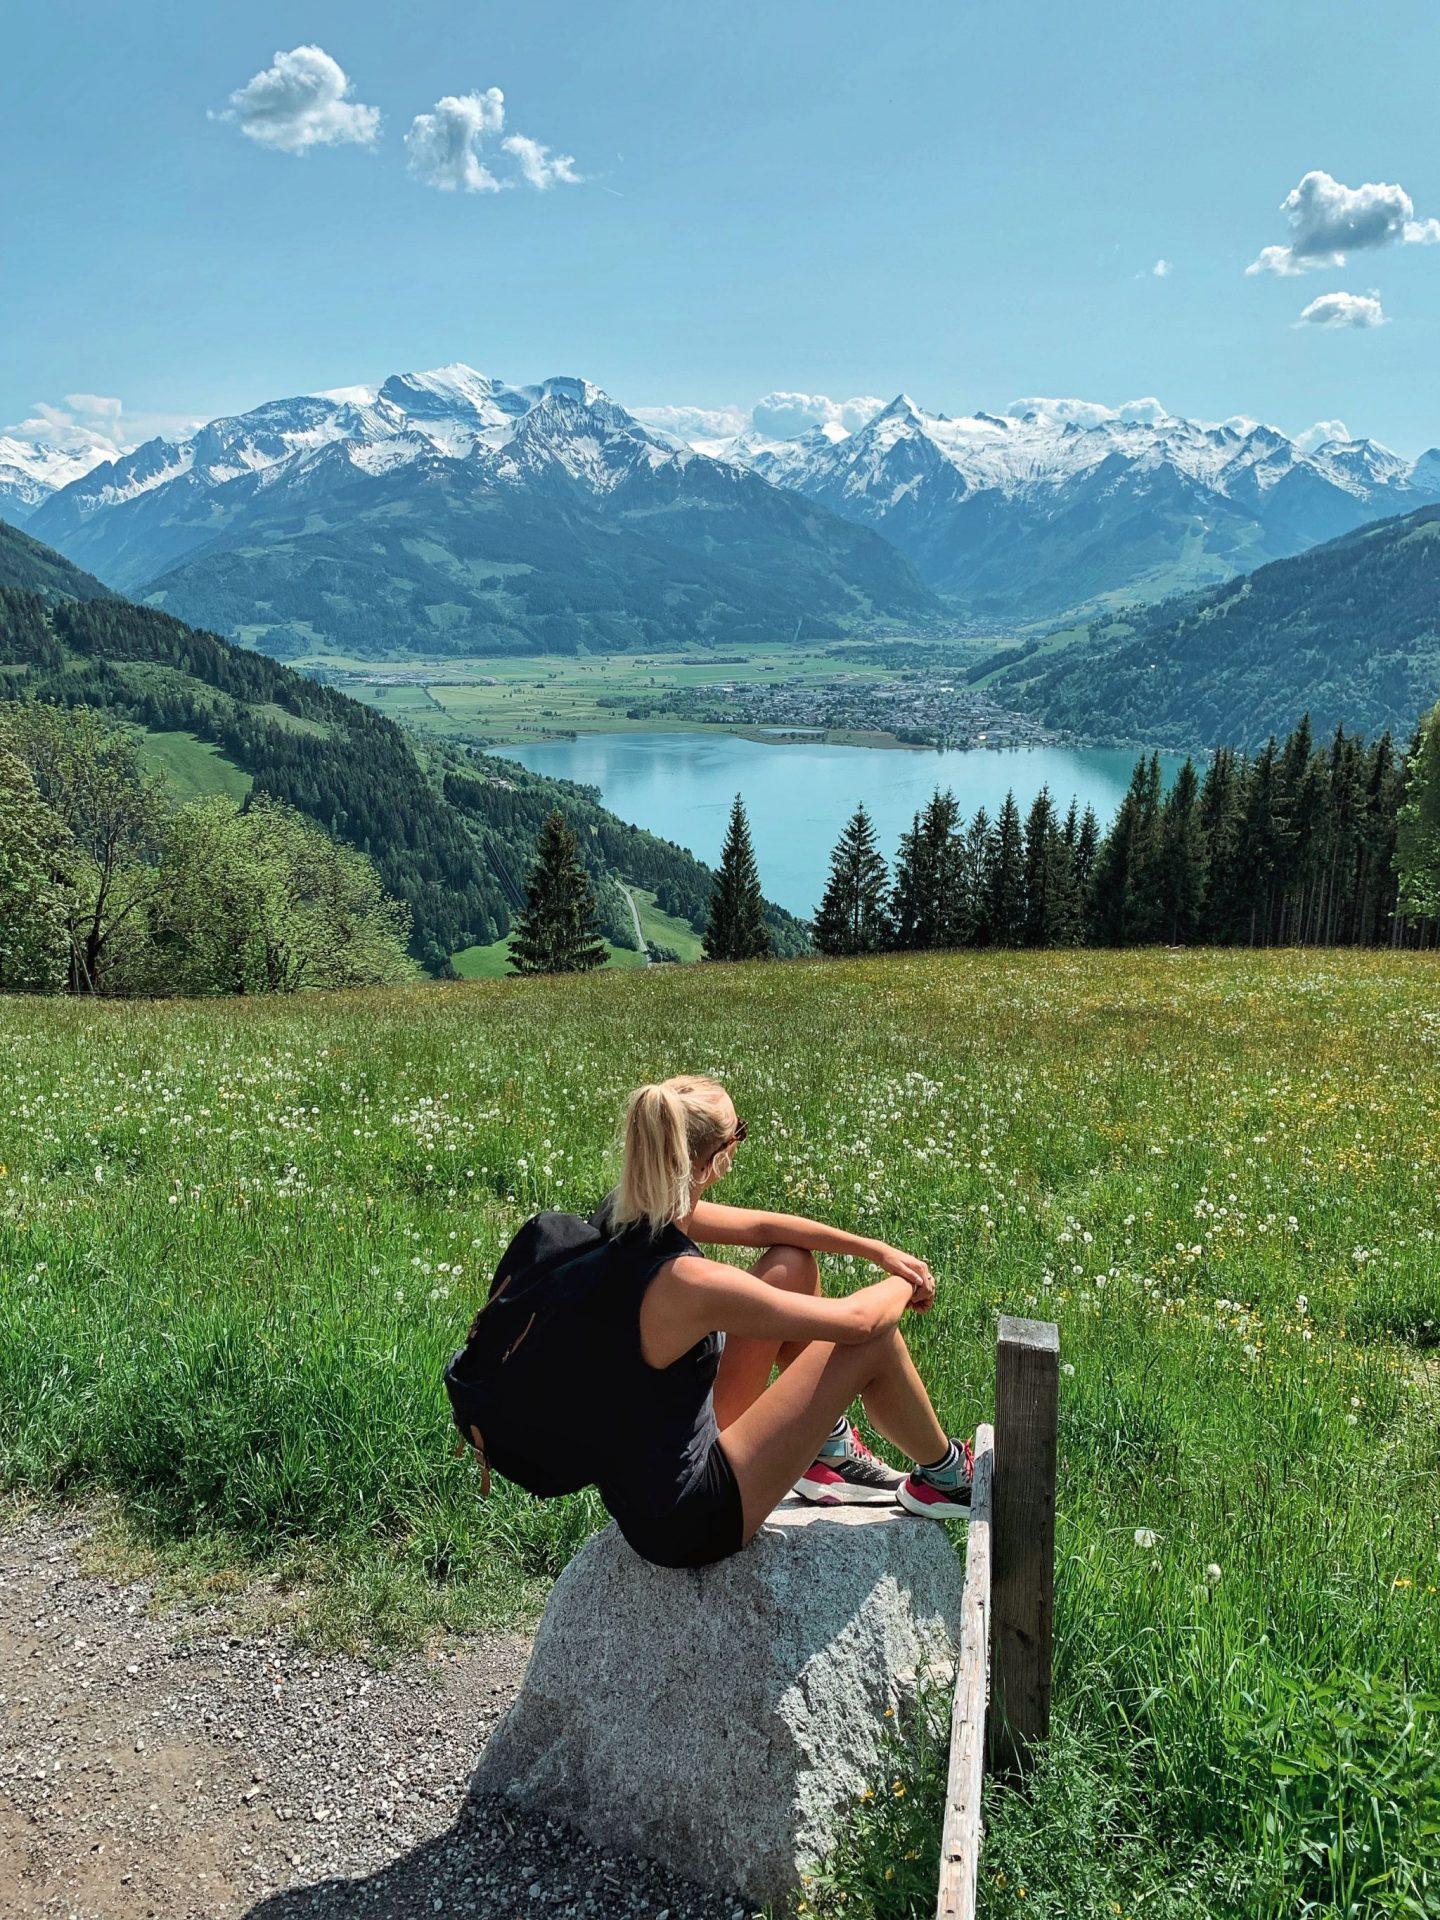 Austria Hiking Guide